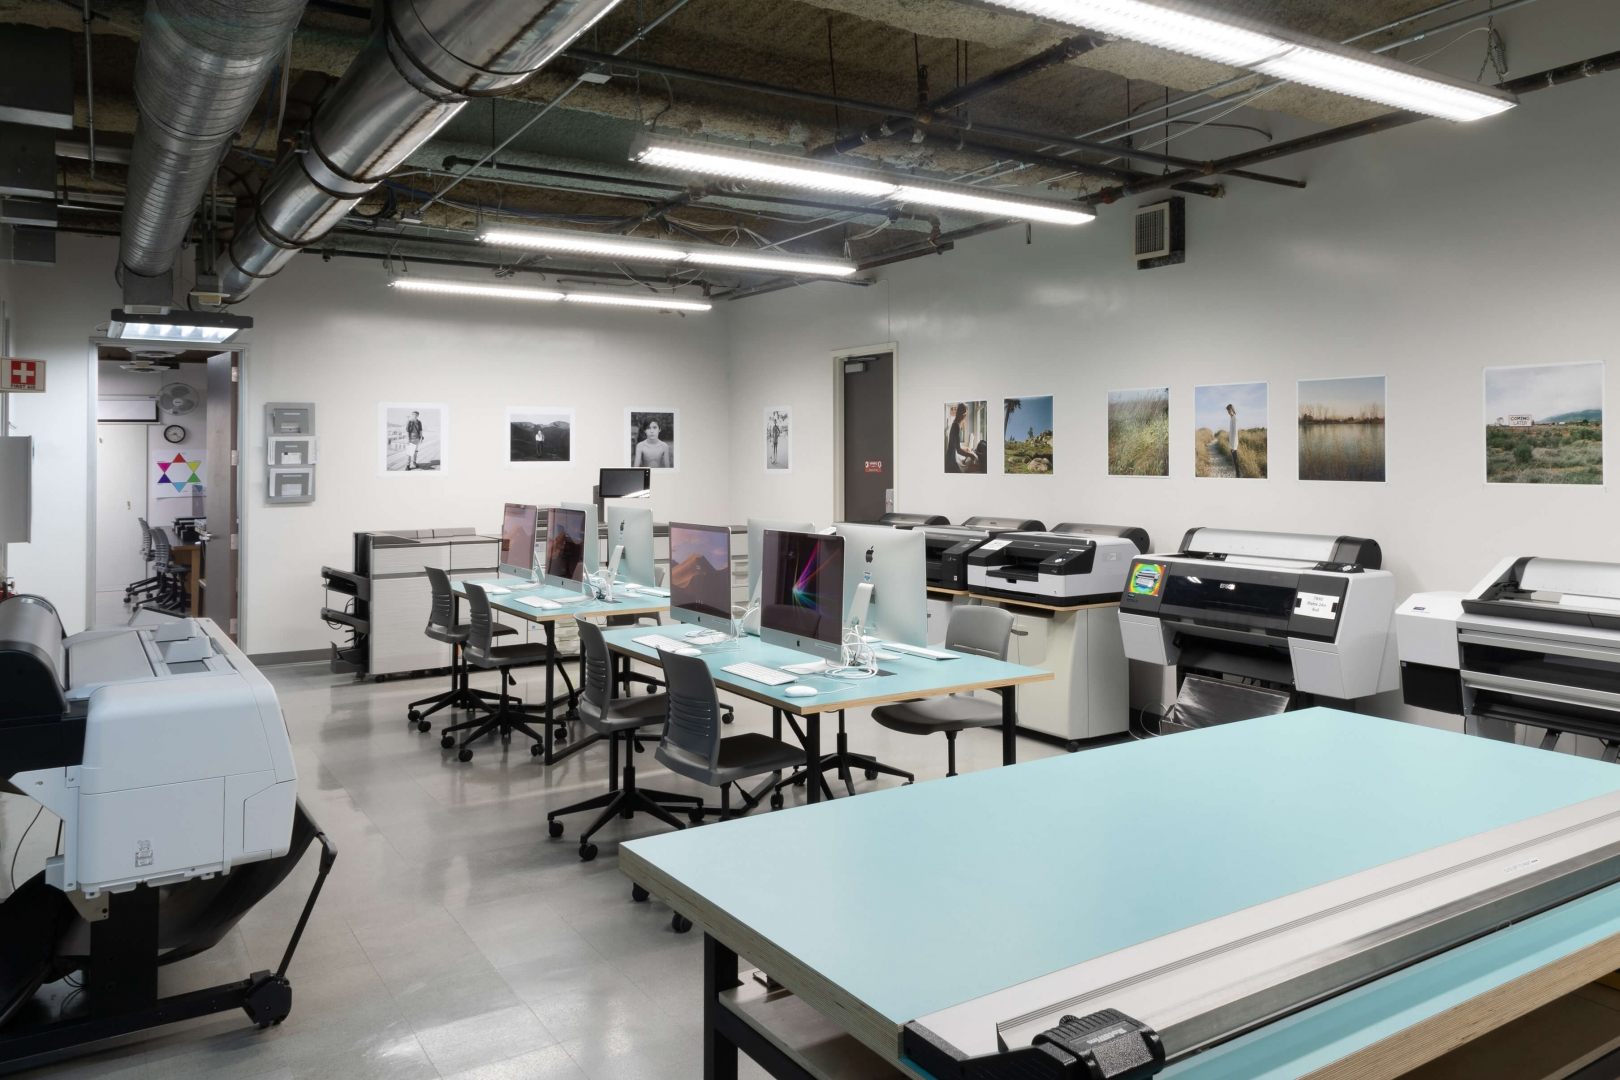 Photo lab printing room